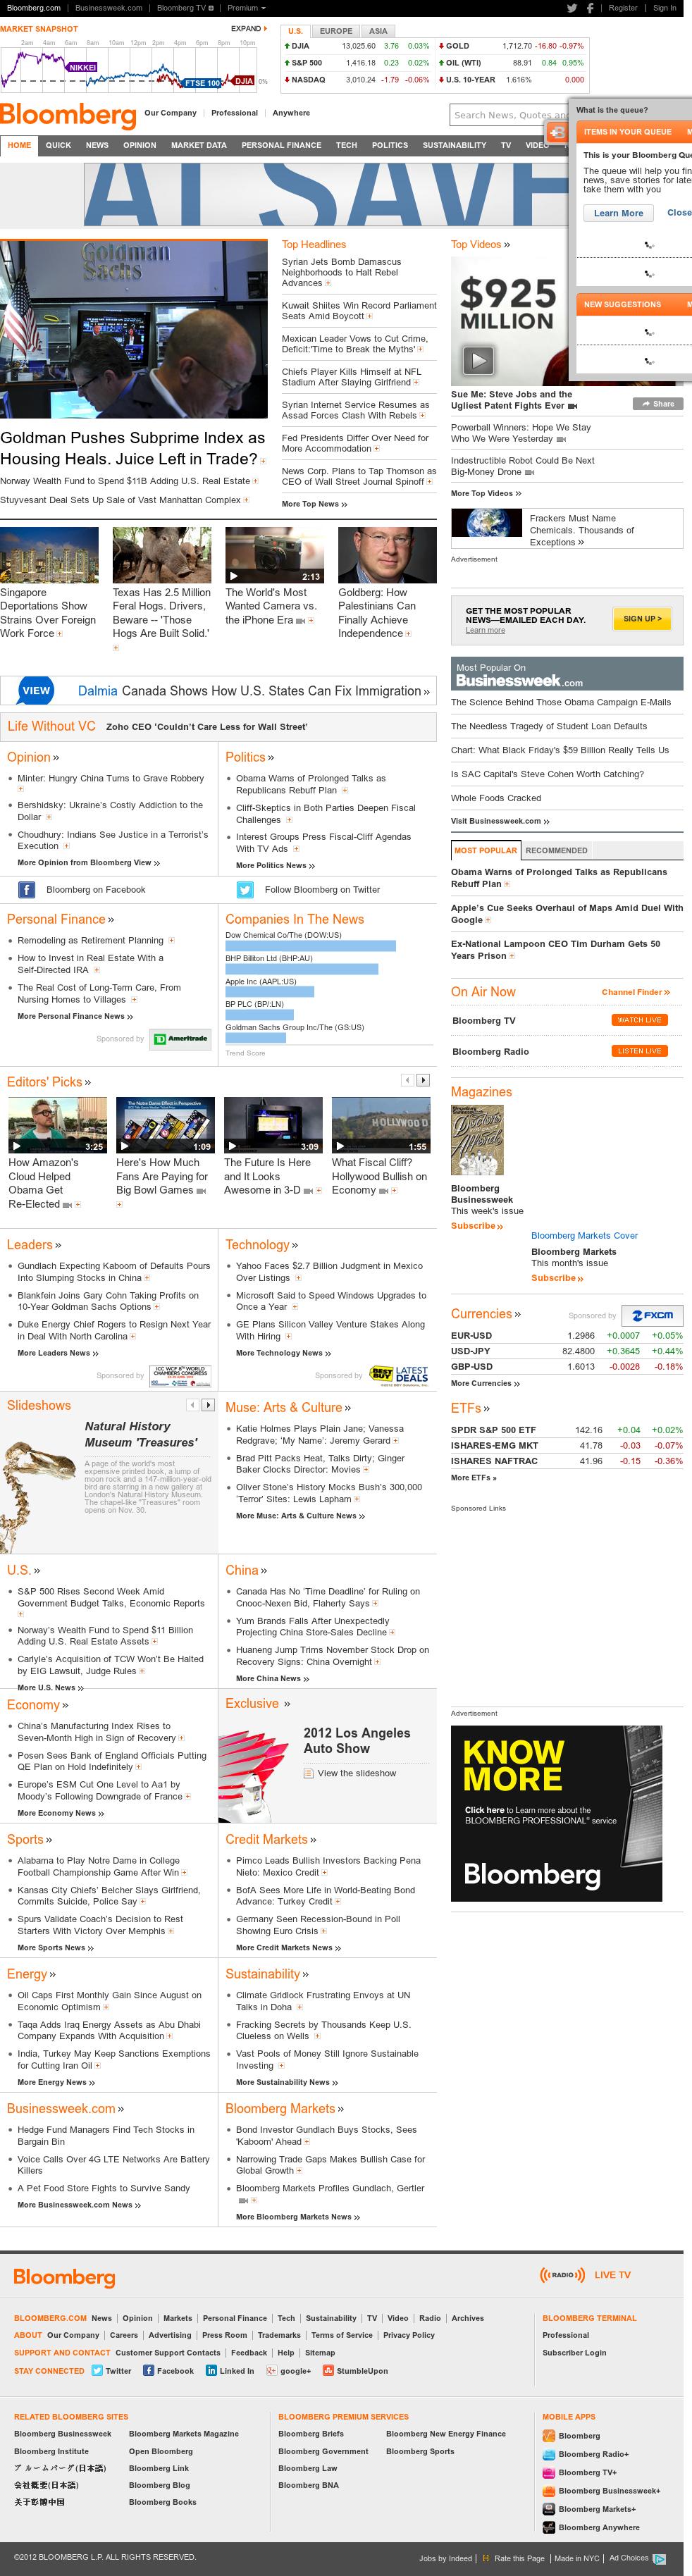 Bloomberg at Sunday Dec. 2, 2012, 2:02 p.m. UTC